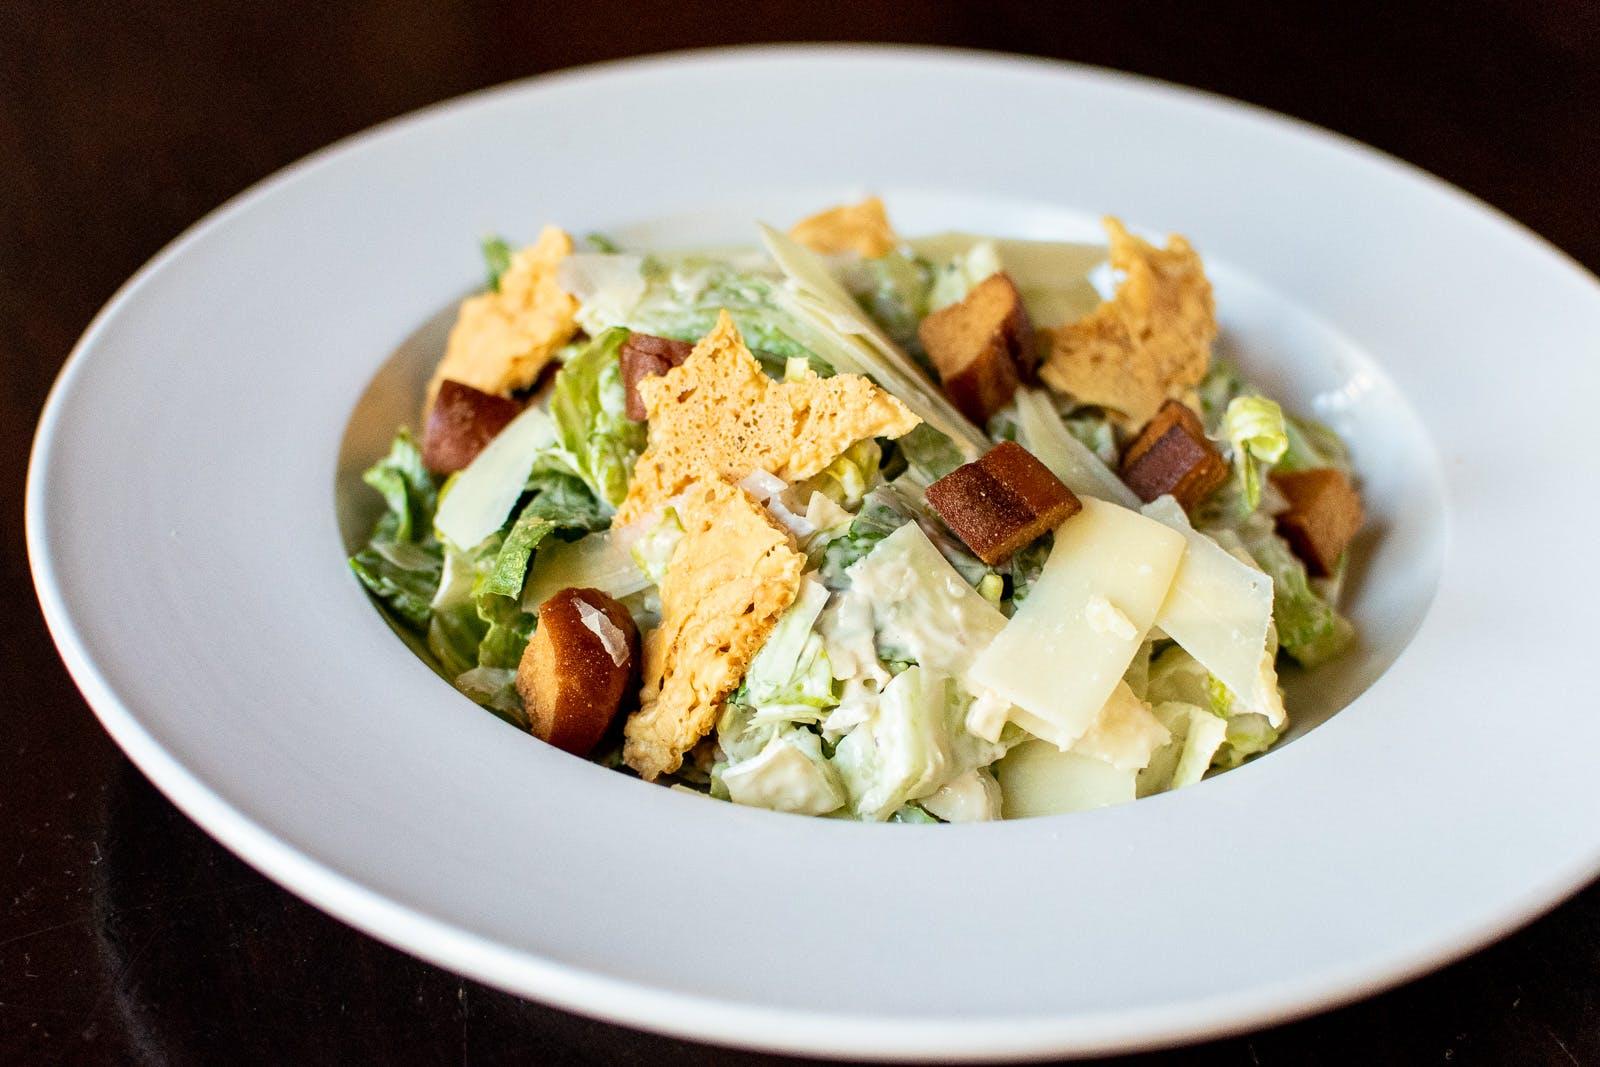 Caesar Salad from Midcoast Wings - University Ave in Cedar Falls, IA